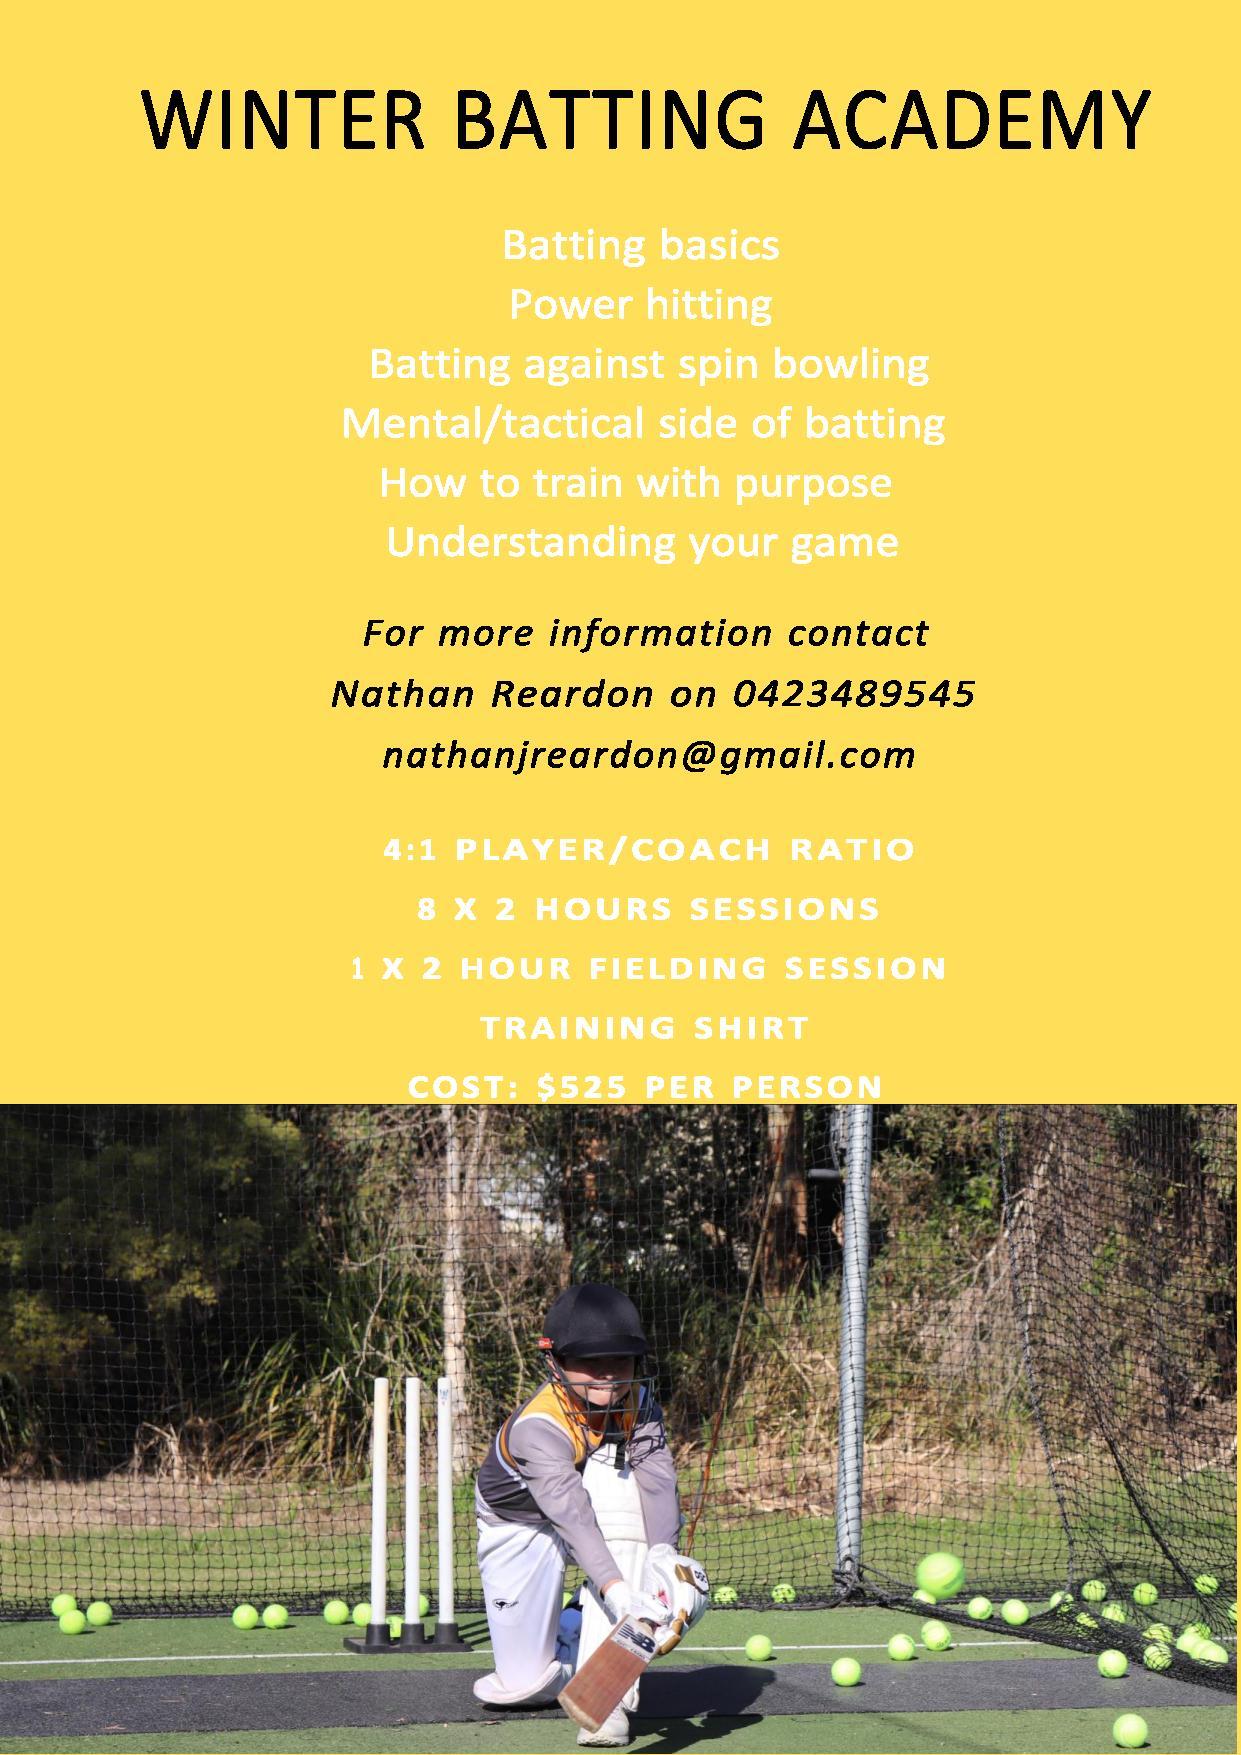 Nathan Reardon Cricket Coaching Winter batting academy2-page-002